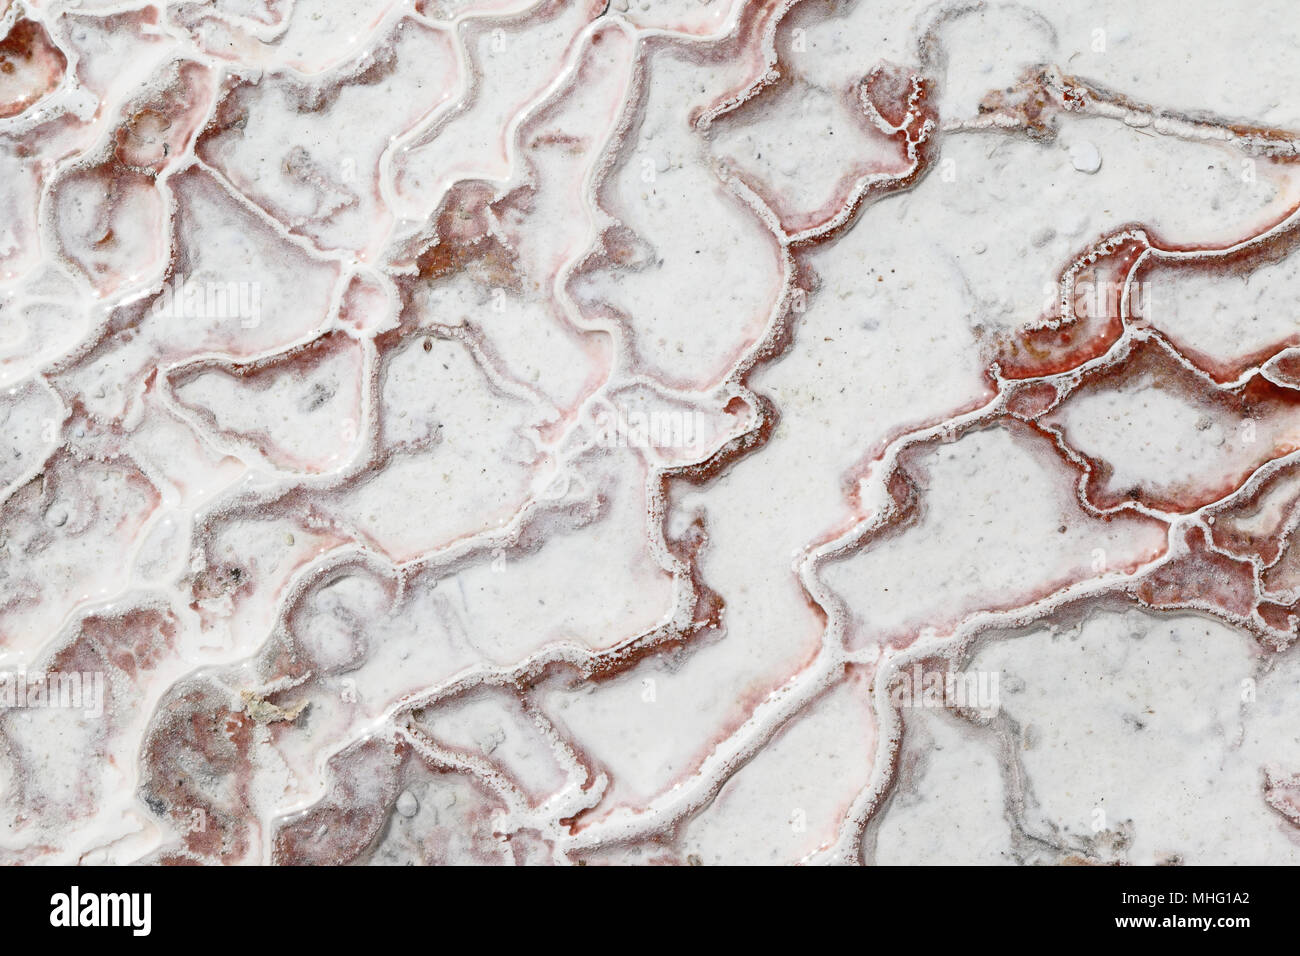 Pamukkale - depósitos de calcio a partir de aguas termales naturales, Turquía Imagen De Stock